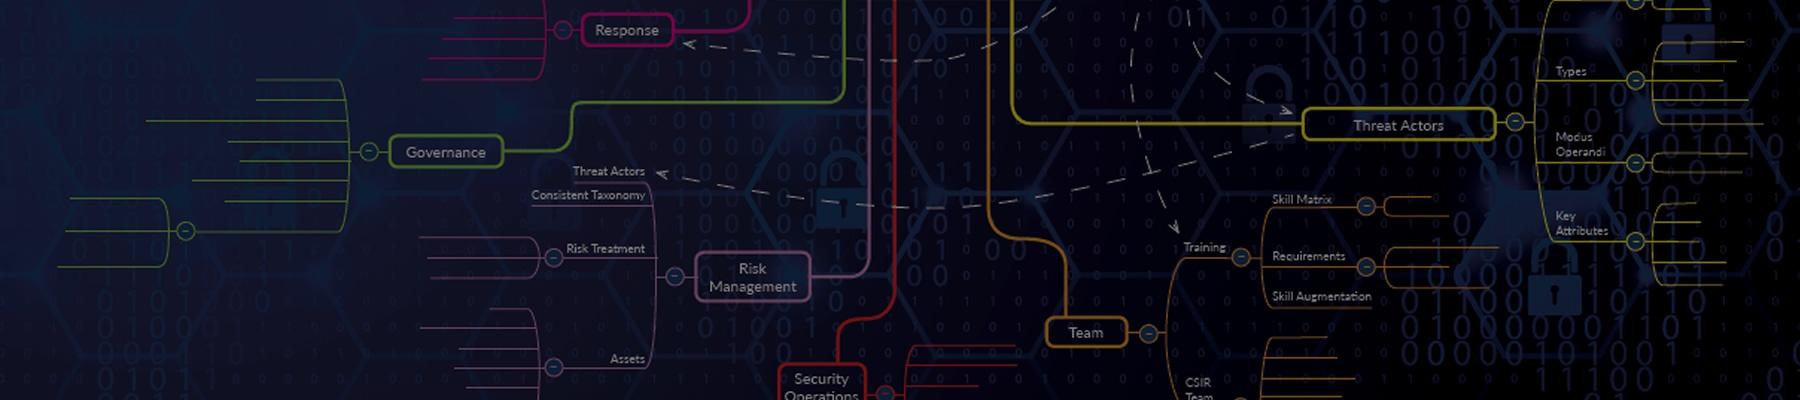 Data_Breach_Mind_Map.jpg